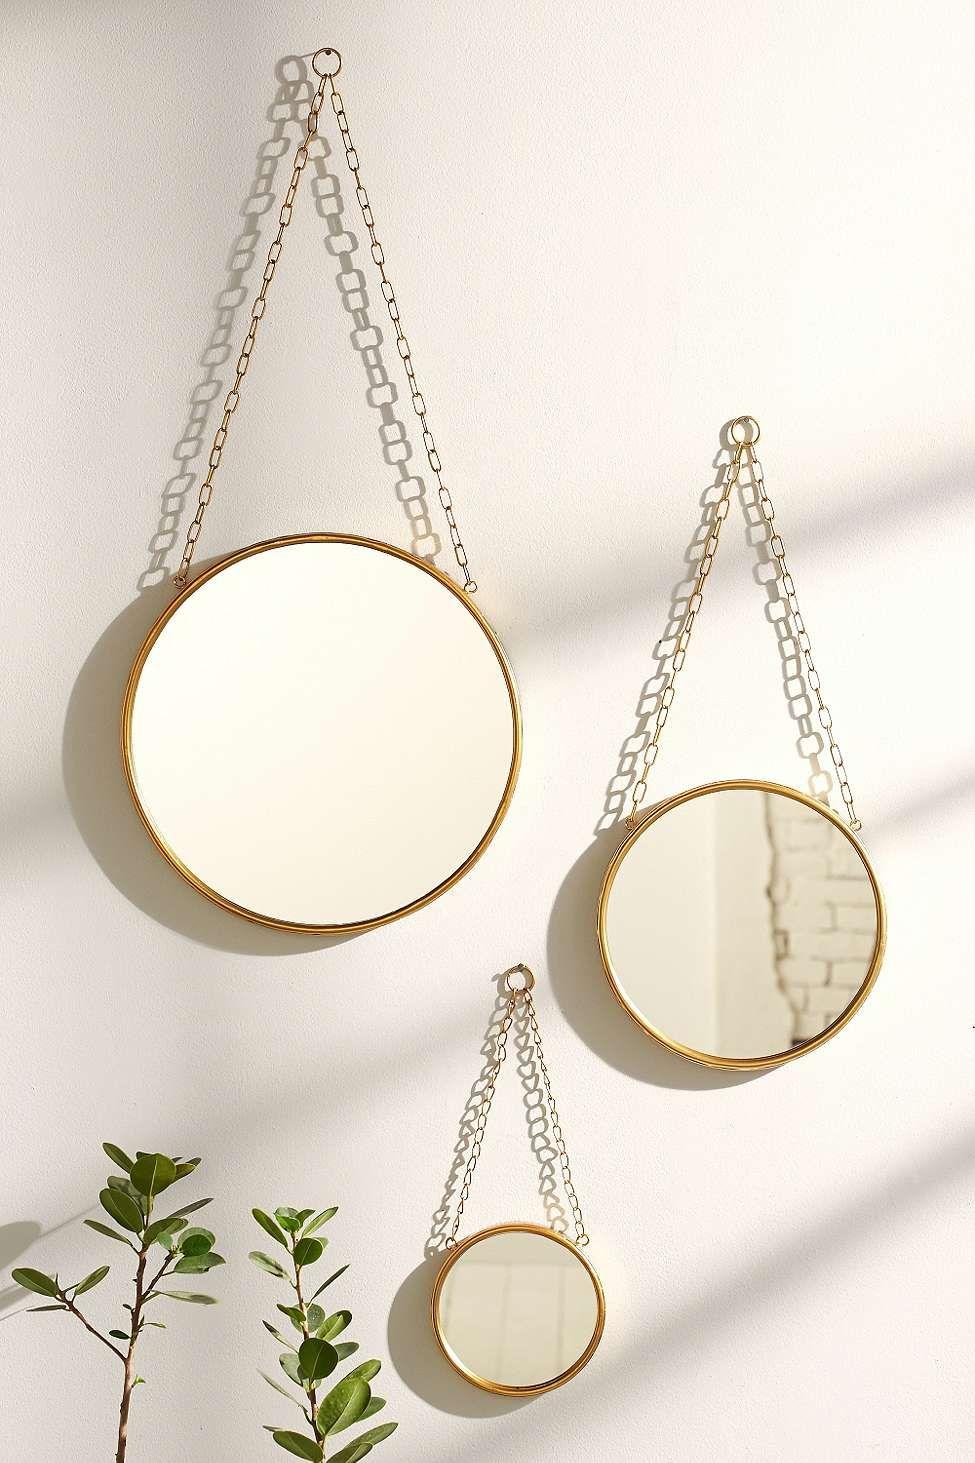 Petit miroir industriel urban outfitters chambre d co pinterest miroir industriel for Miroir petit